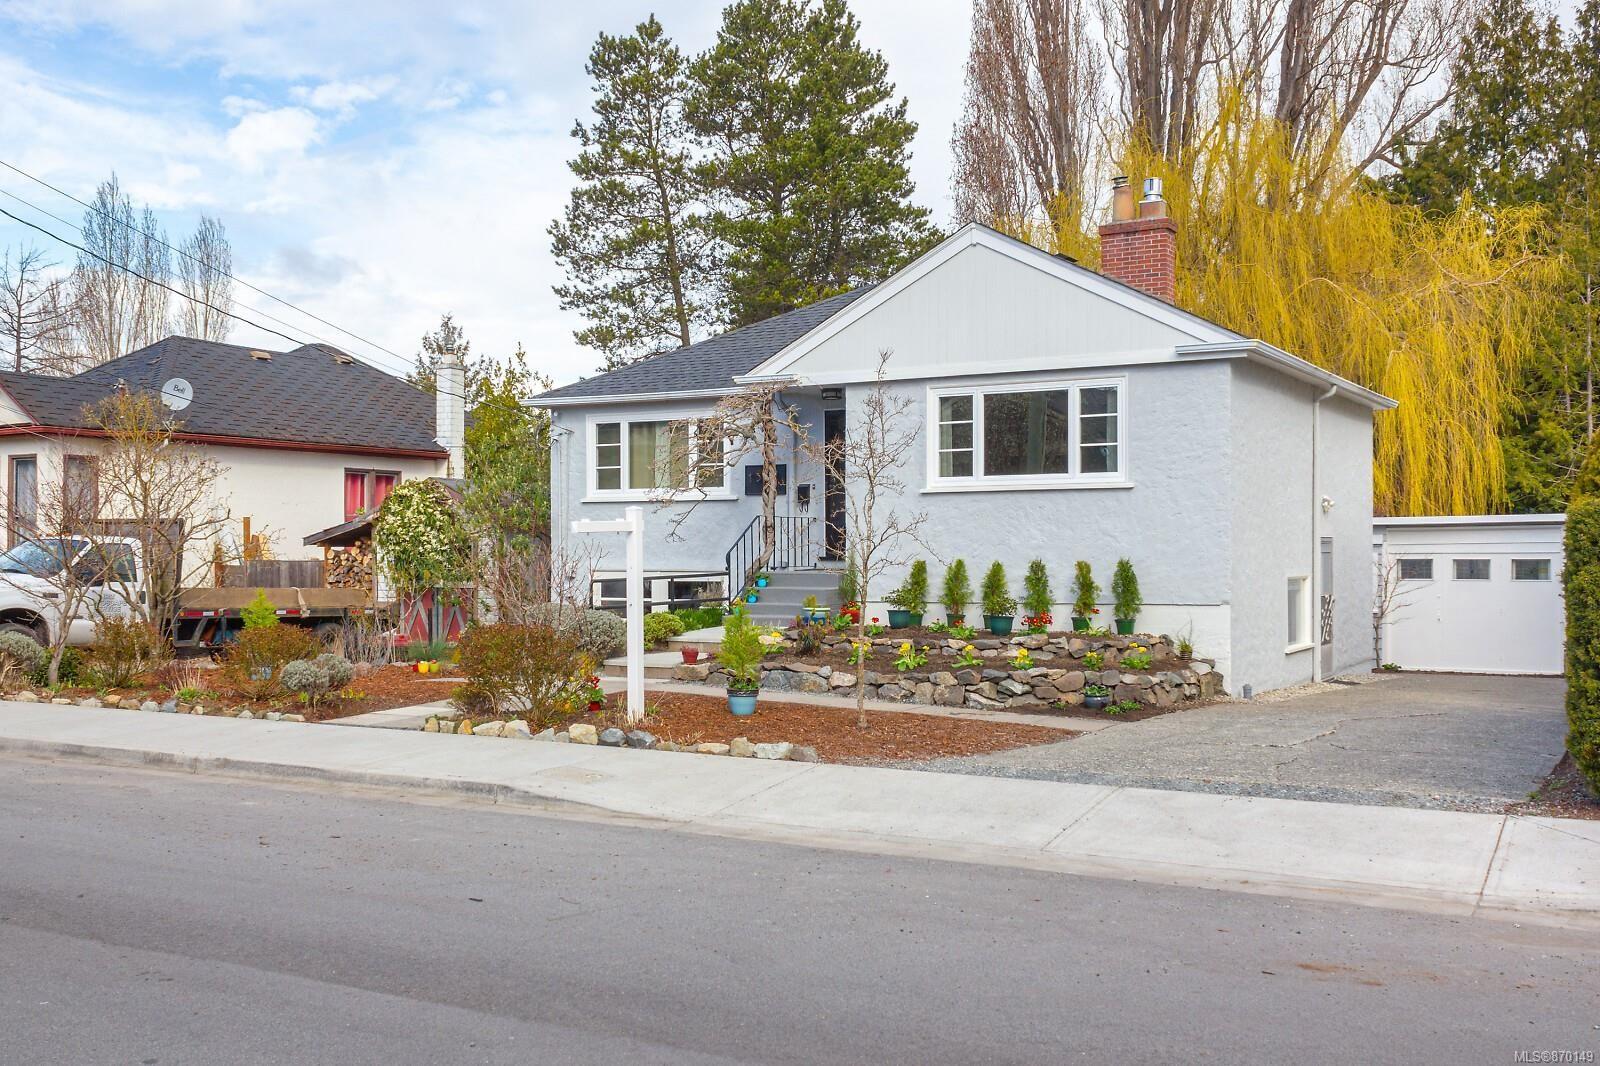 Main Photo: 1352 Grant St in : Vi Fernwood House for sale (Victoria)  : MLS®# 870149